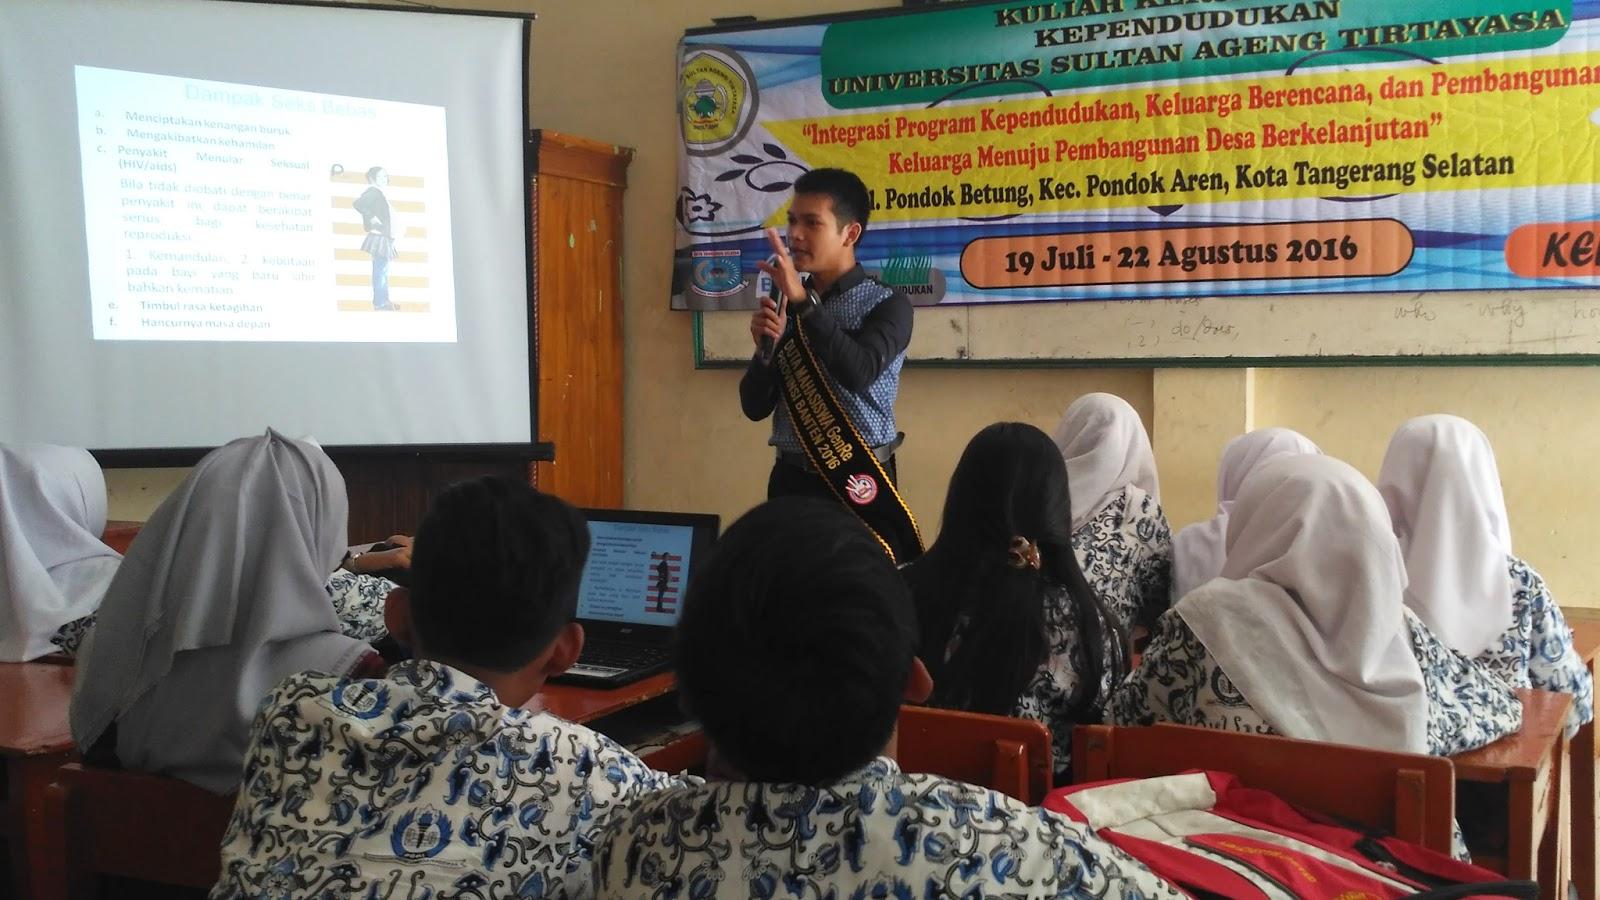 Kegiatan ini menjadi wujud aksi nyata untuk mengkampanyekan program GenRe kepada kalangan Remaja